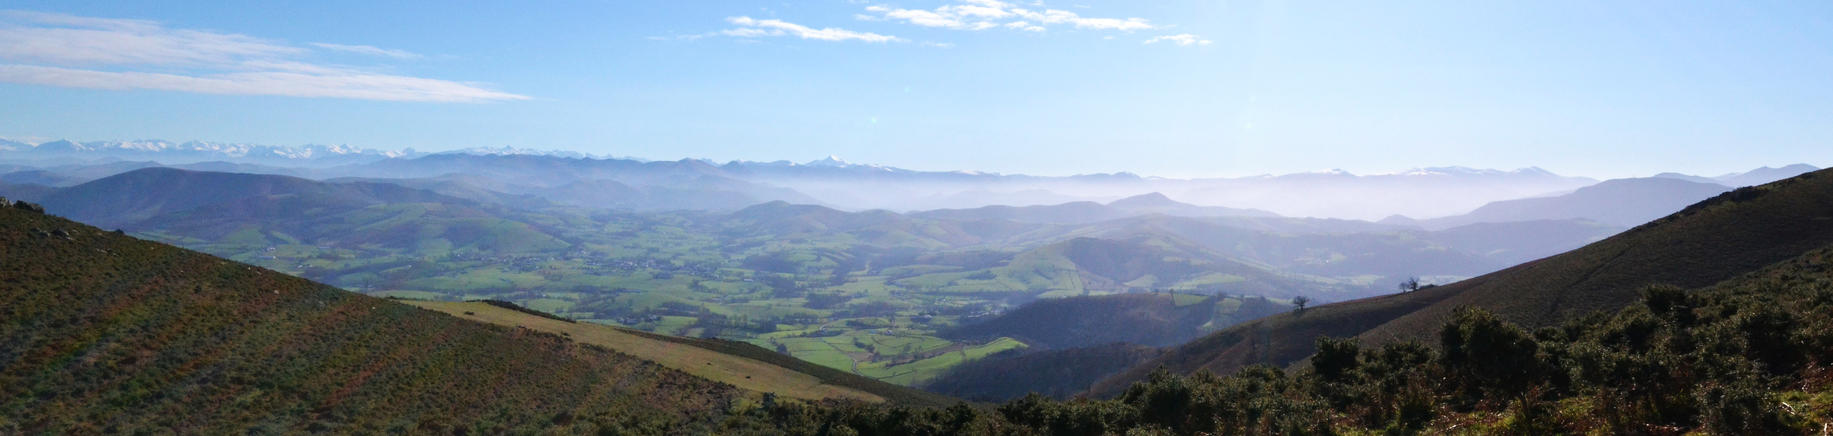 Les Pyrenees vues depuis le Baigura by Aude-la-randonneuse